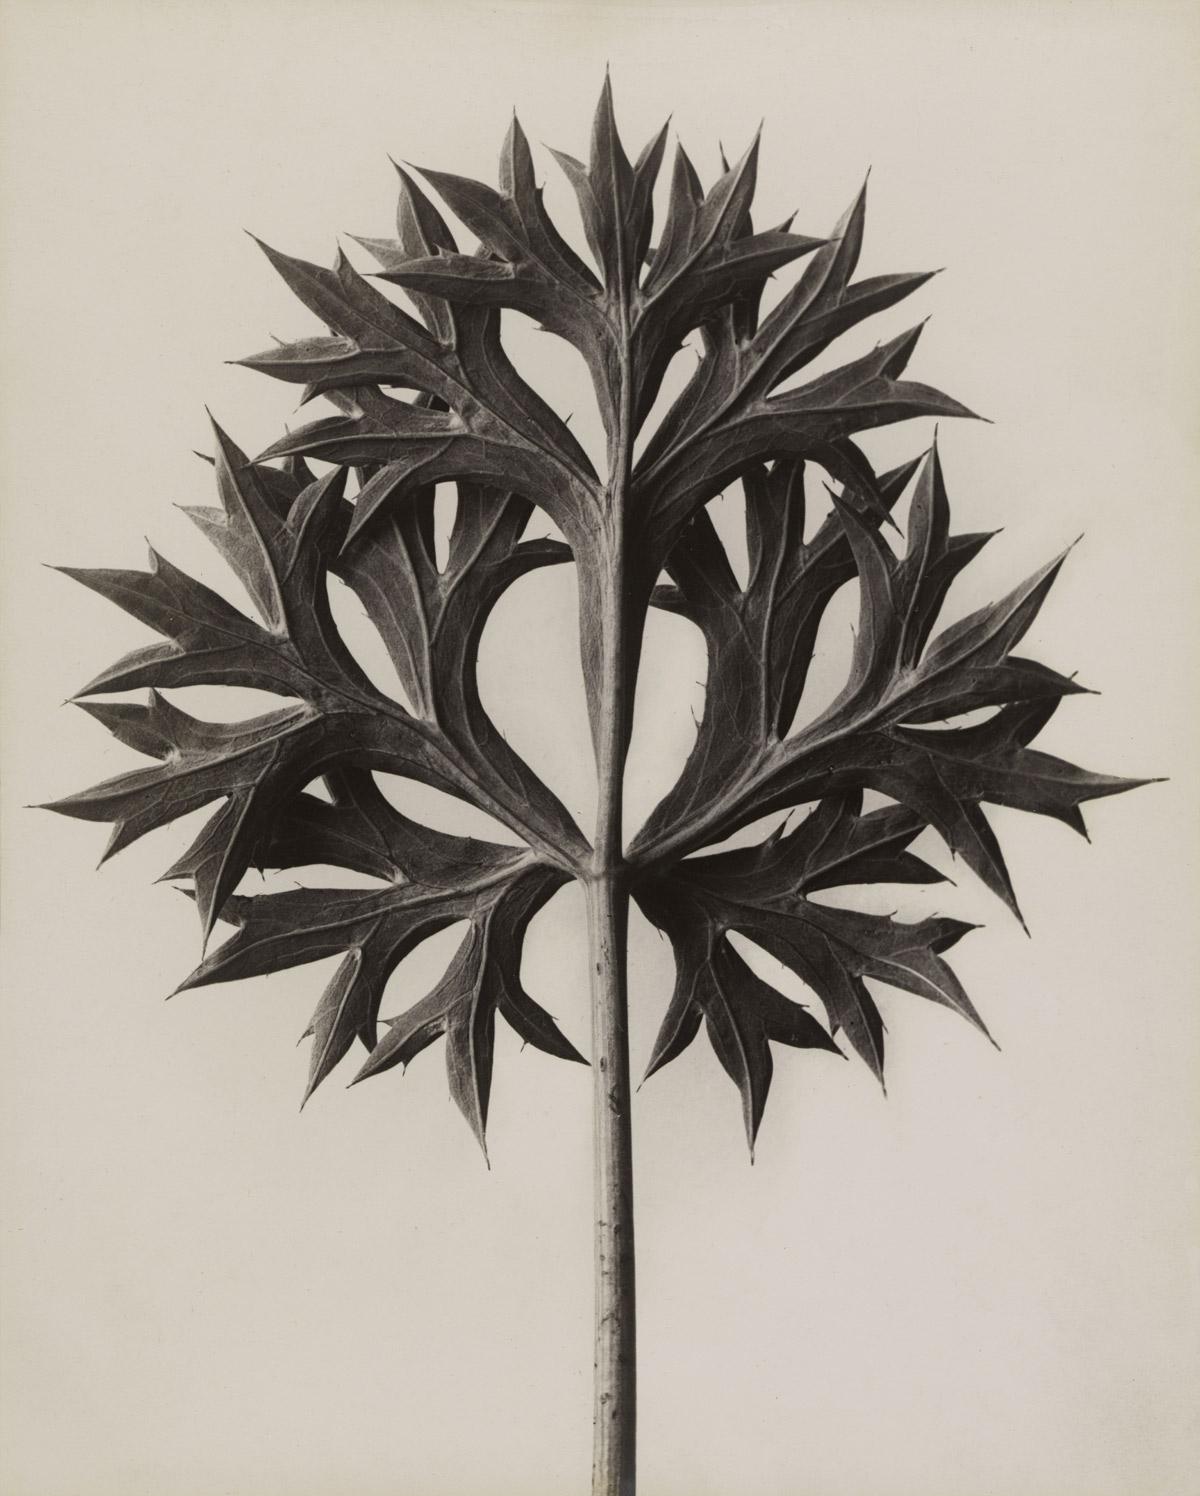 Fotó: Karl Blossfeldt: Eryngium bourgatii. Bourgatis Eryngo. Ördögszekér, Iringó növénynemzetség, 1928 előtt<br />Stiftung Ann und Jürgen Wilde, Pinakothek der Moderne, München